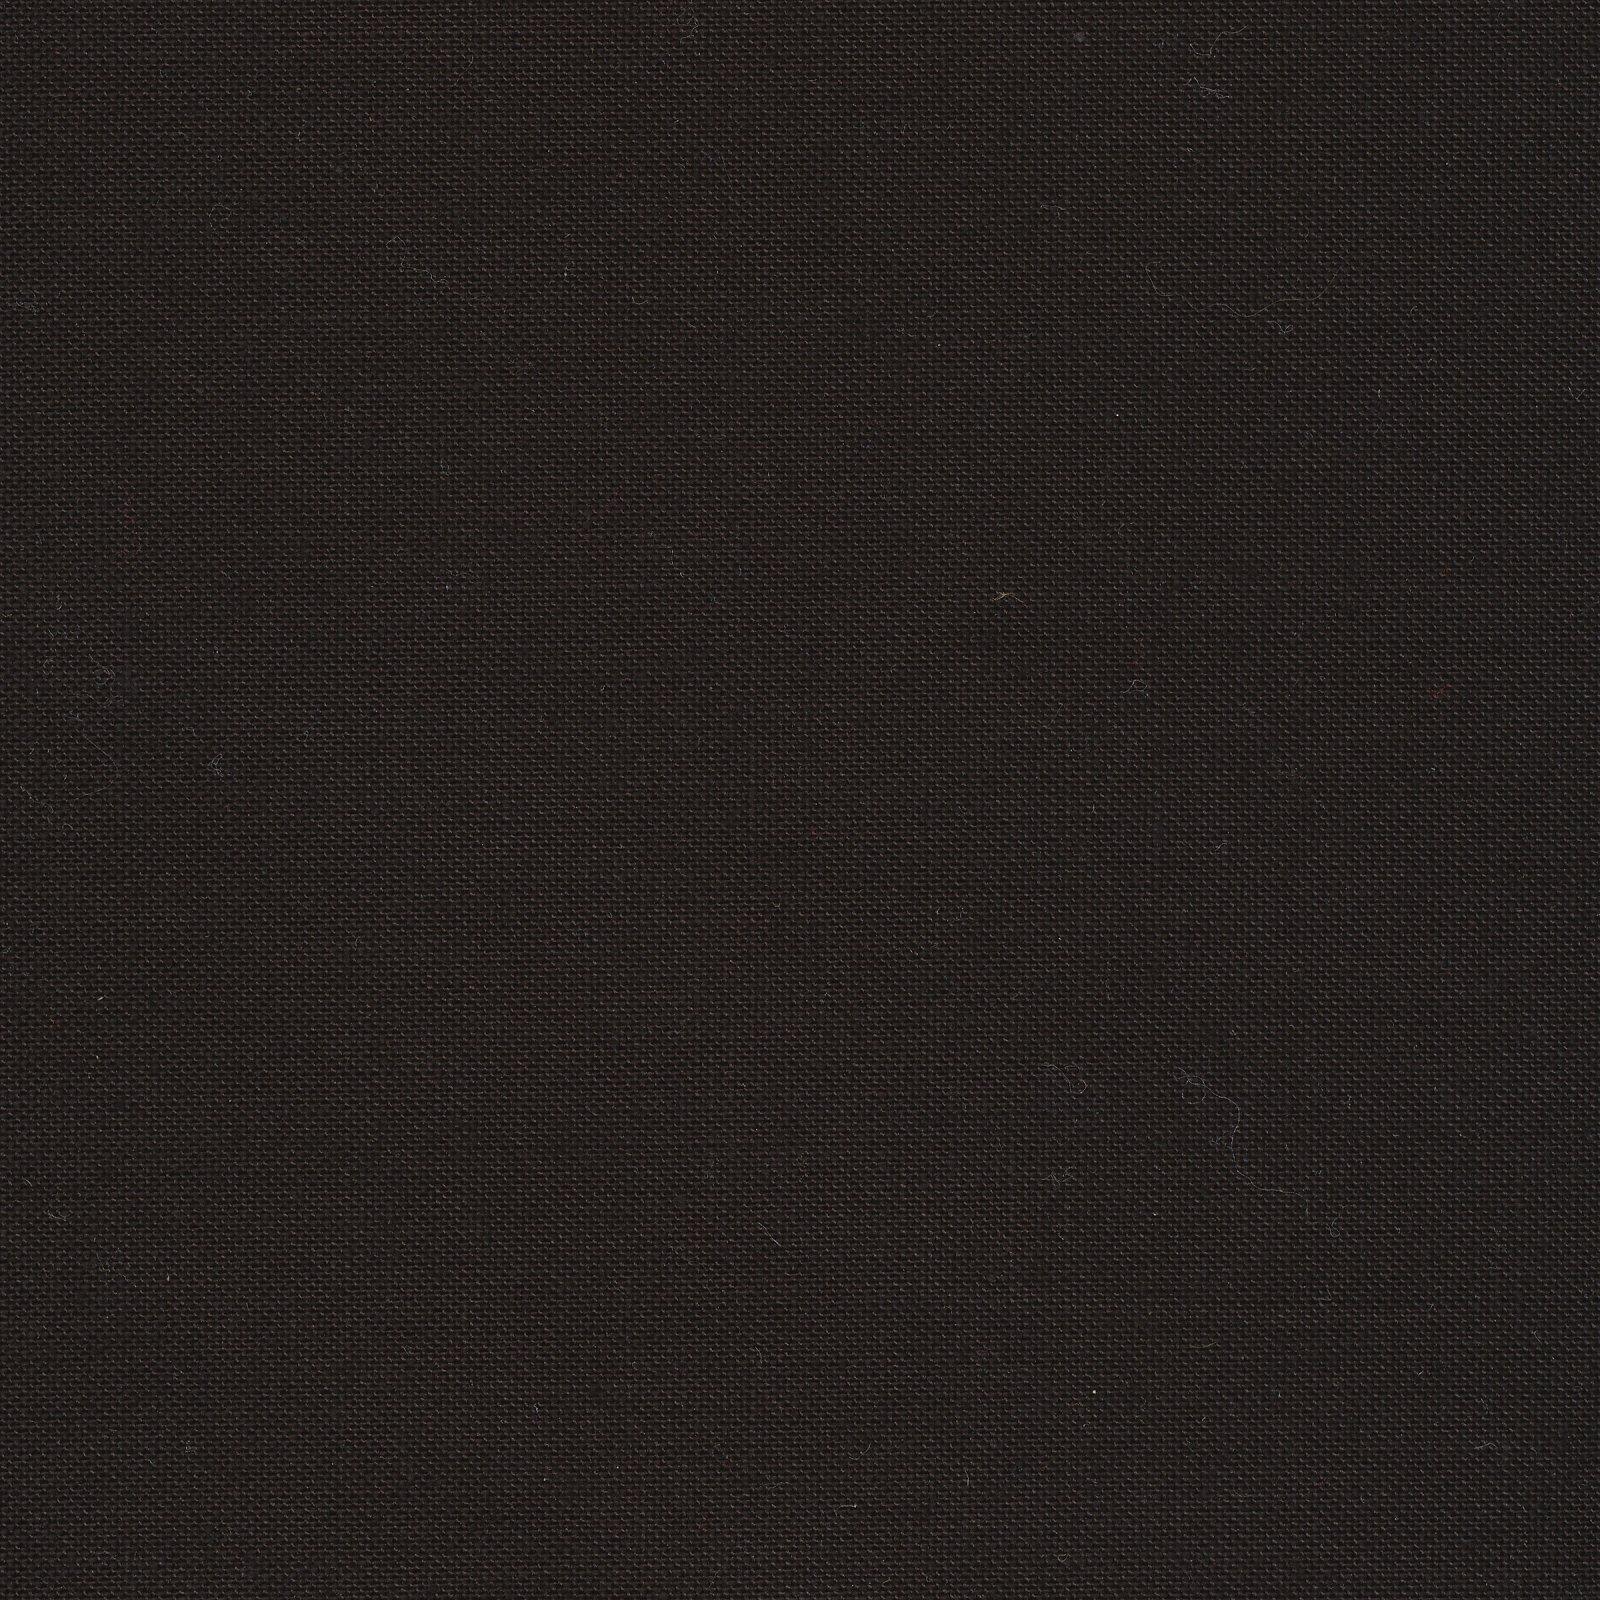 KONA COTTON - KONA-BLACK